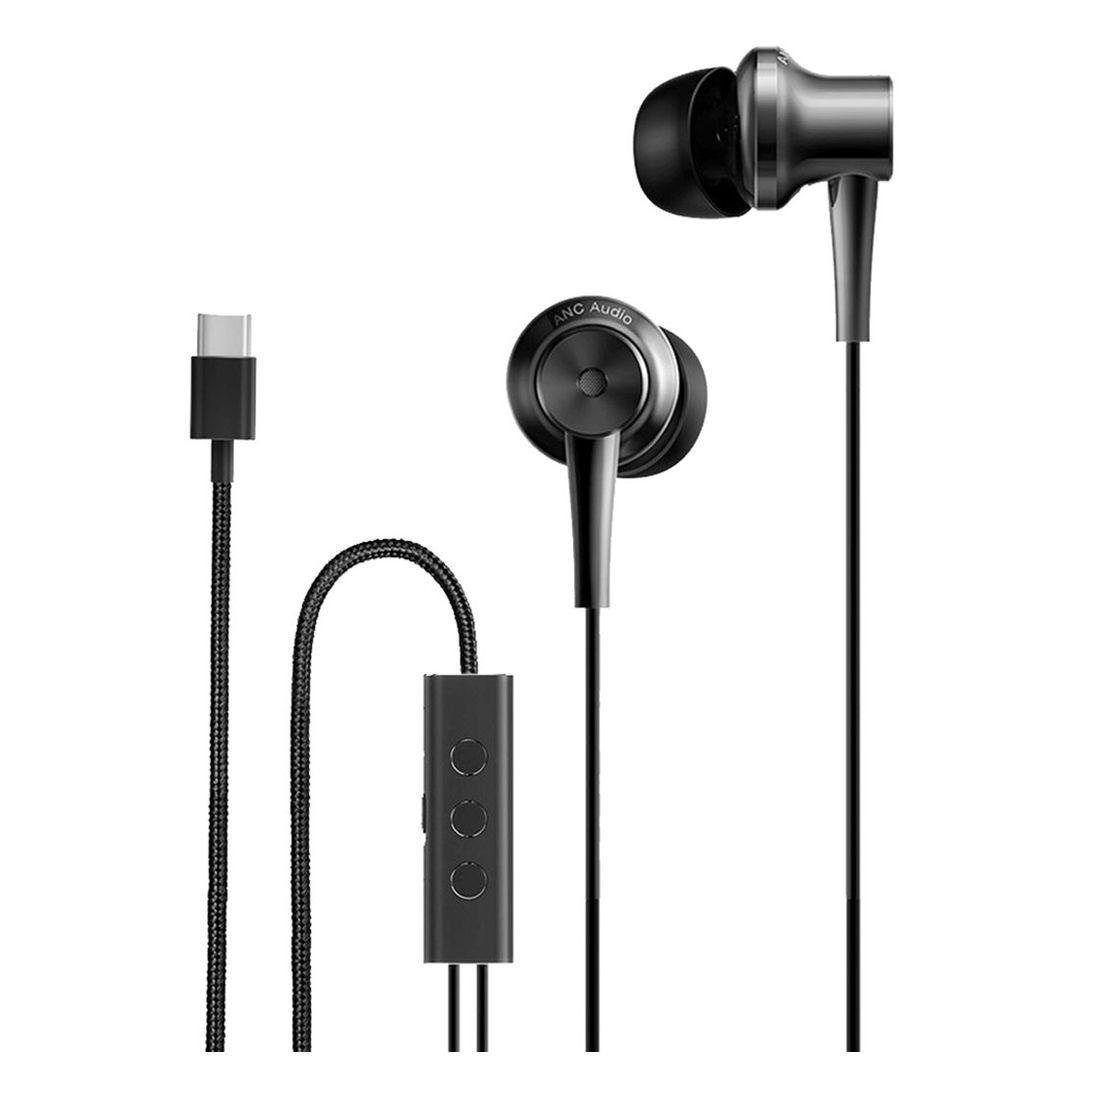 Xiaomi Mi Noise Cancelling Type-C Earphones - Black